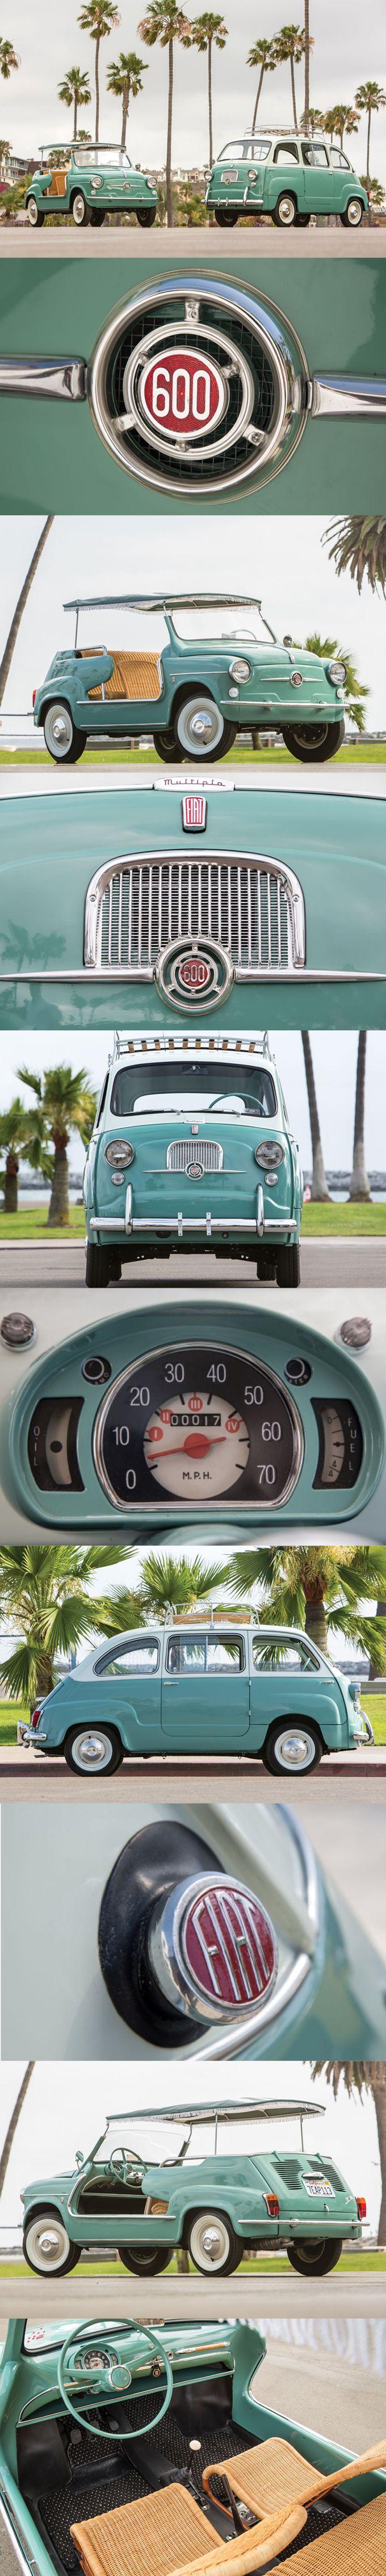 1957 Fiat 600 Multipla / 1961 Fiat 600 Jolly / mint green white / Italy / MPV / beach car / 17-269